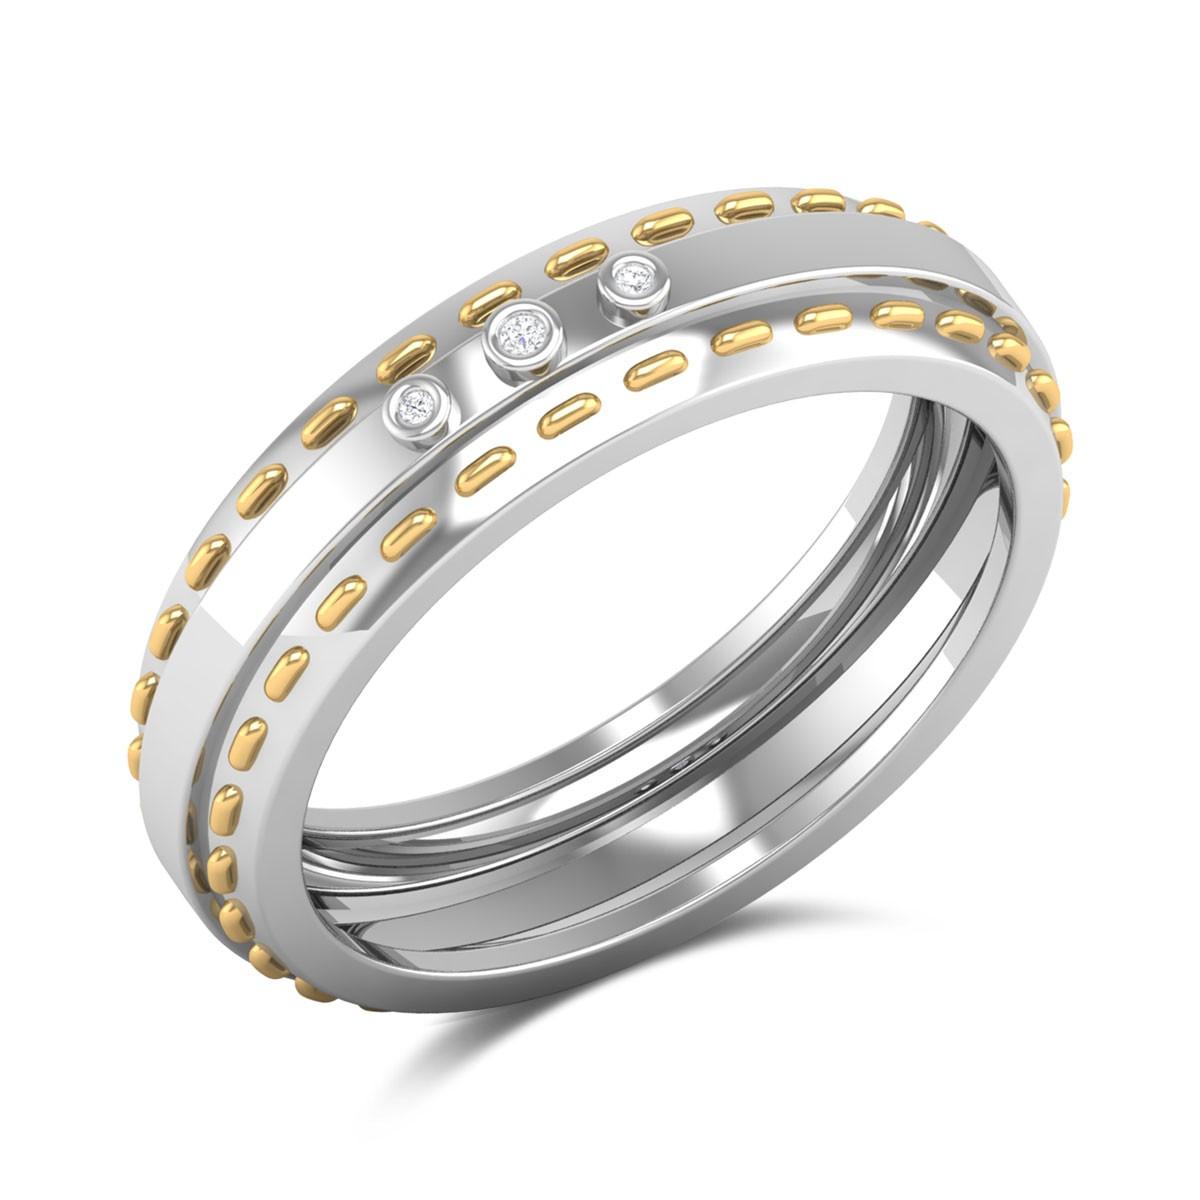 Dalip Diamond Ring